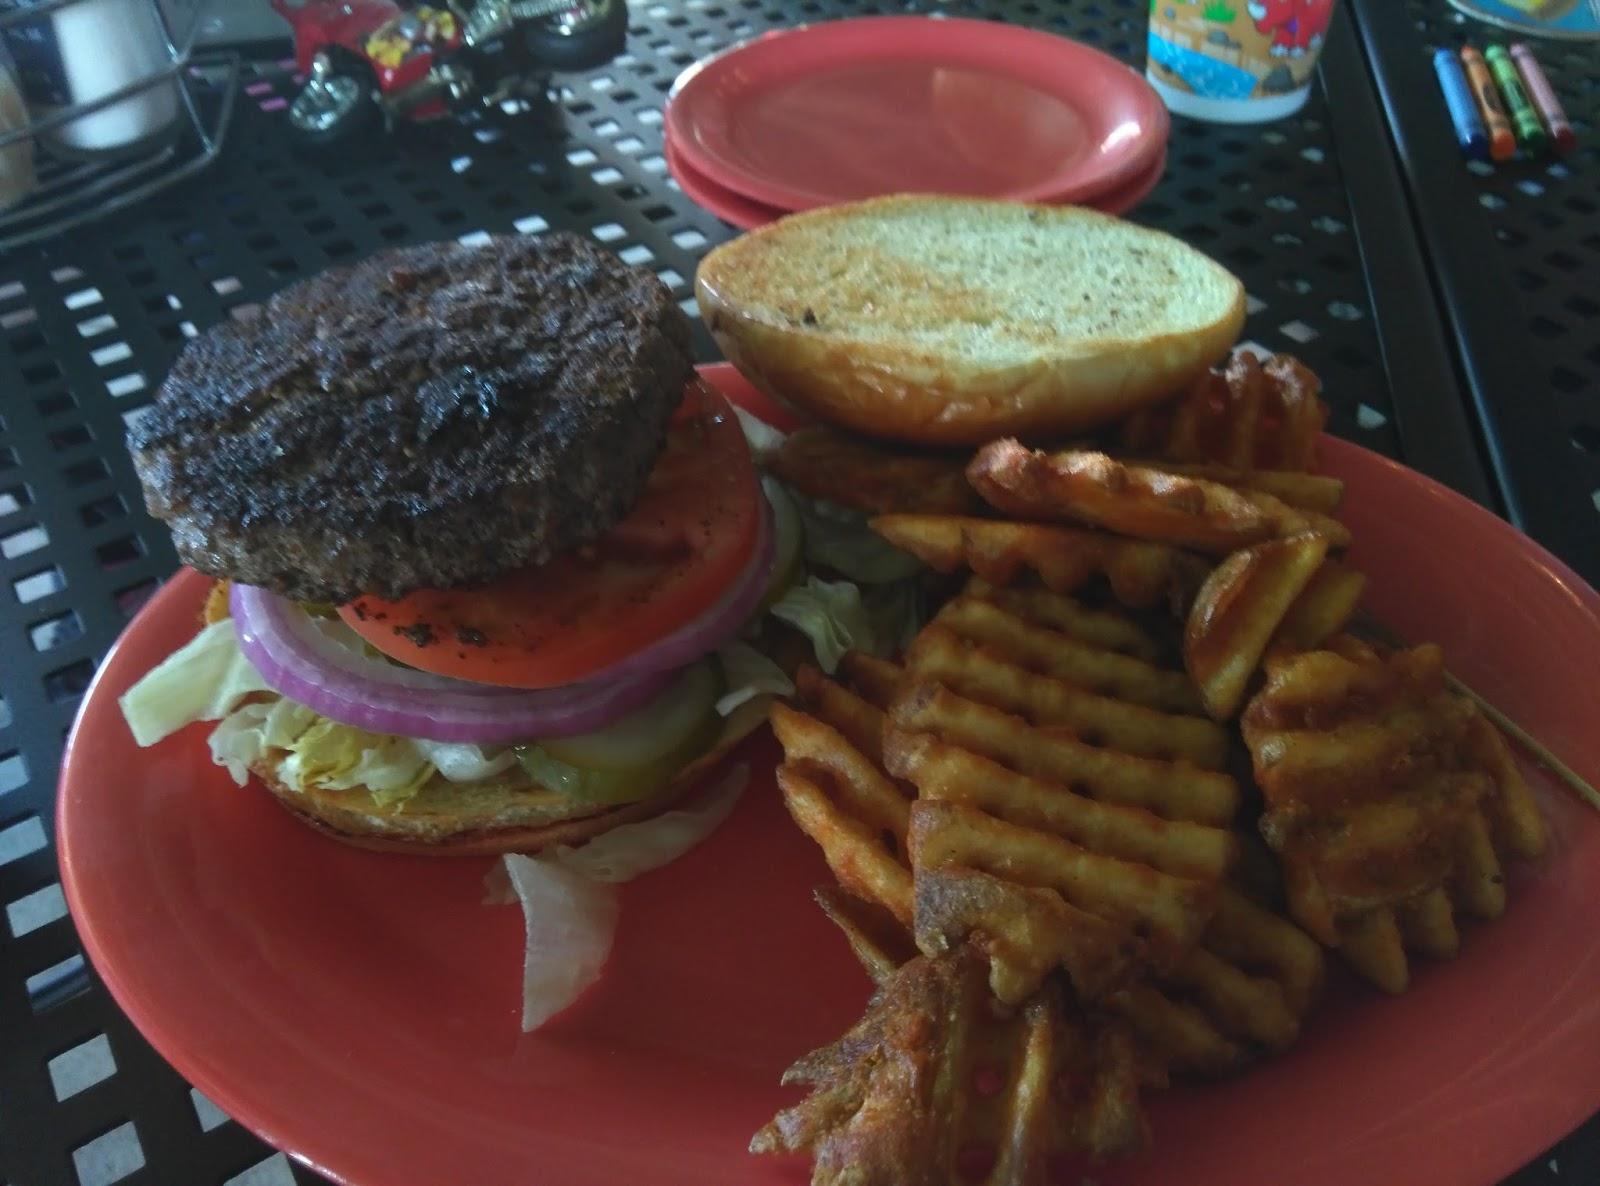 new cincinati burger guys and gals